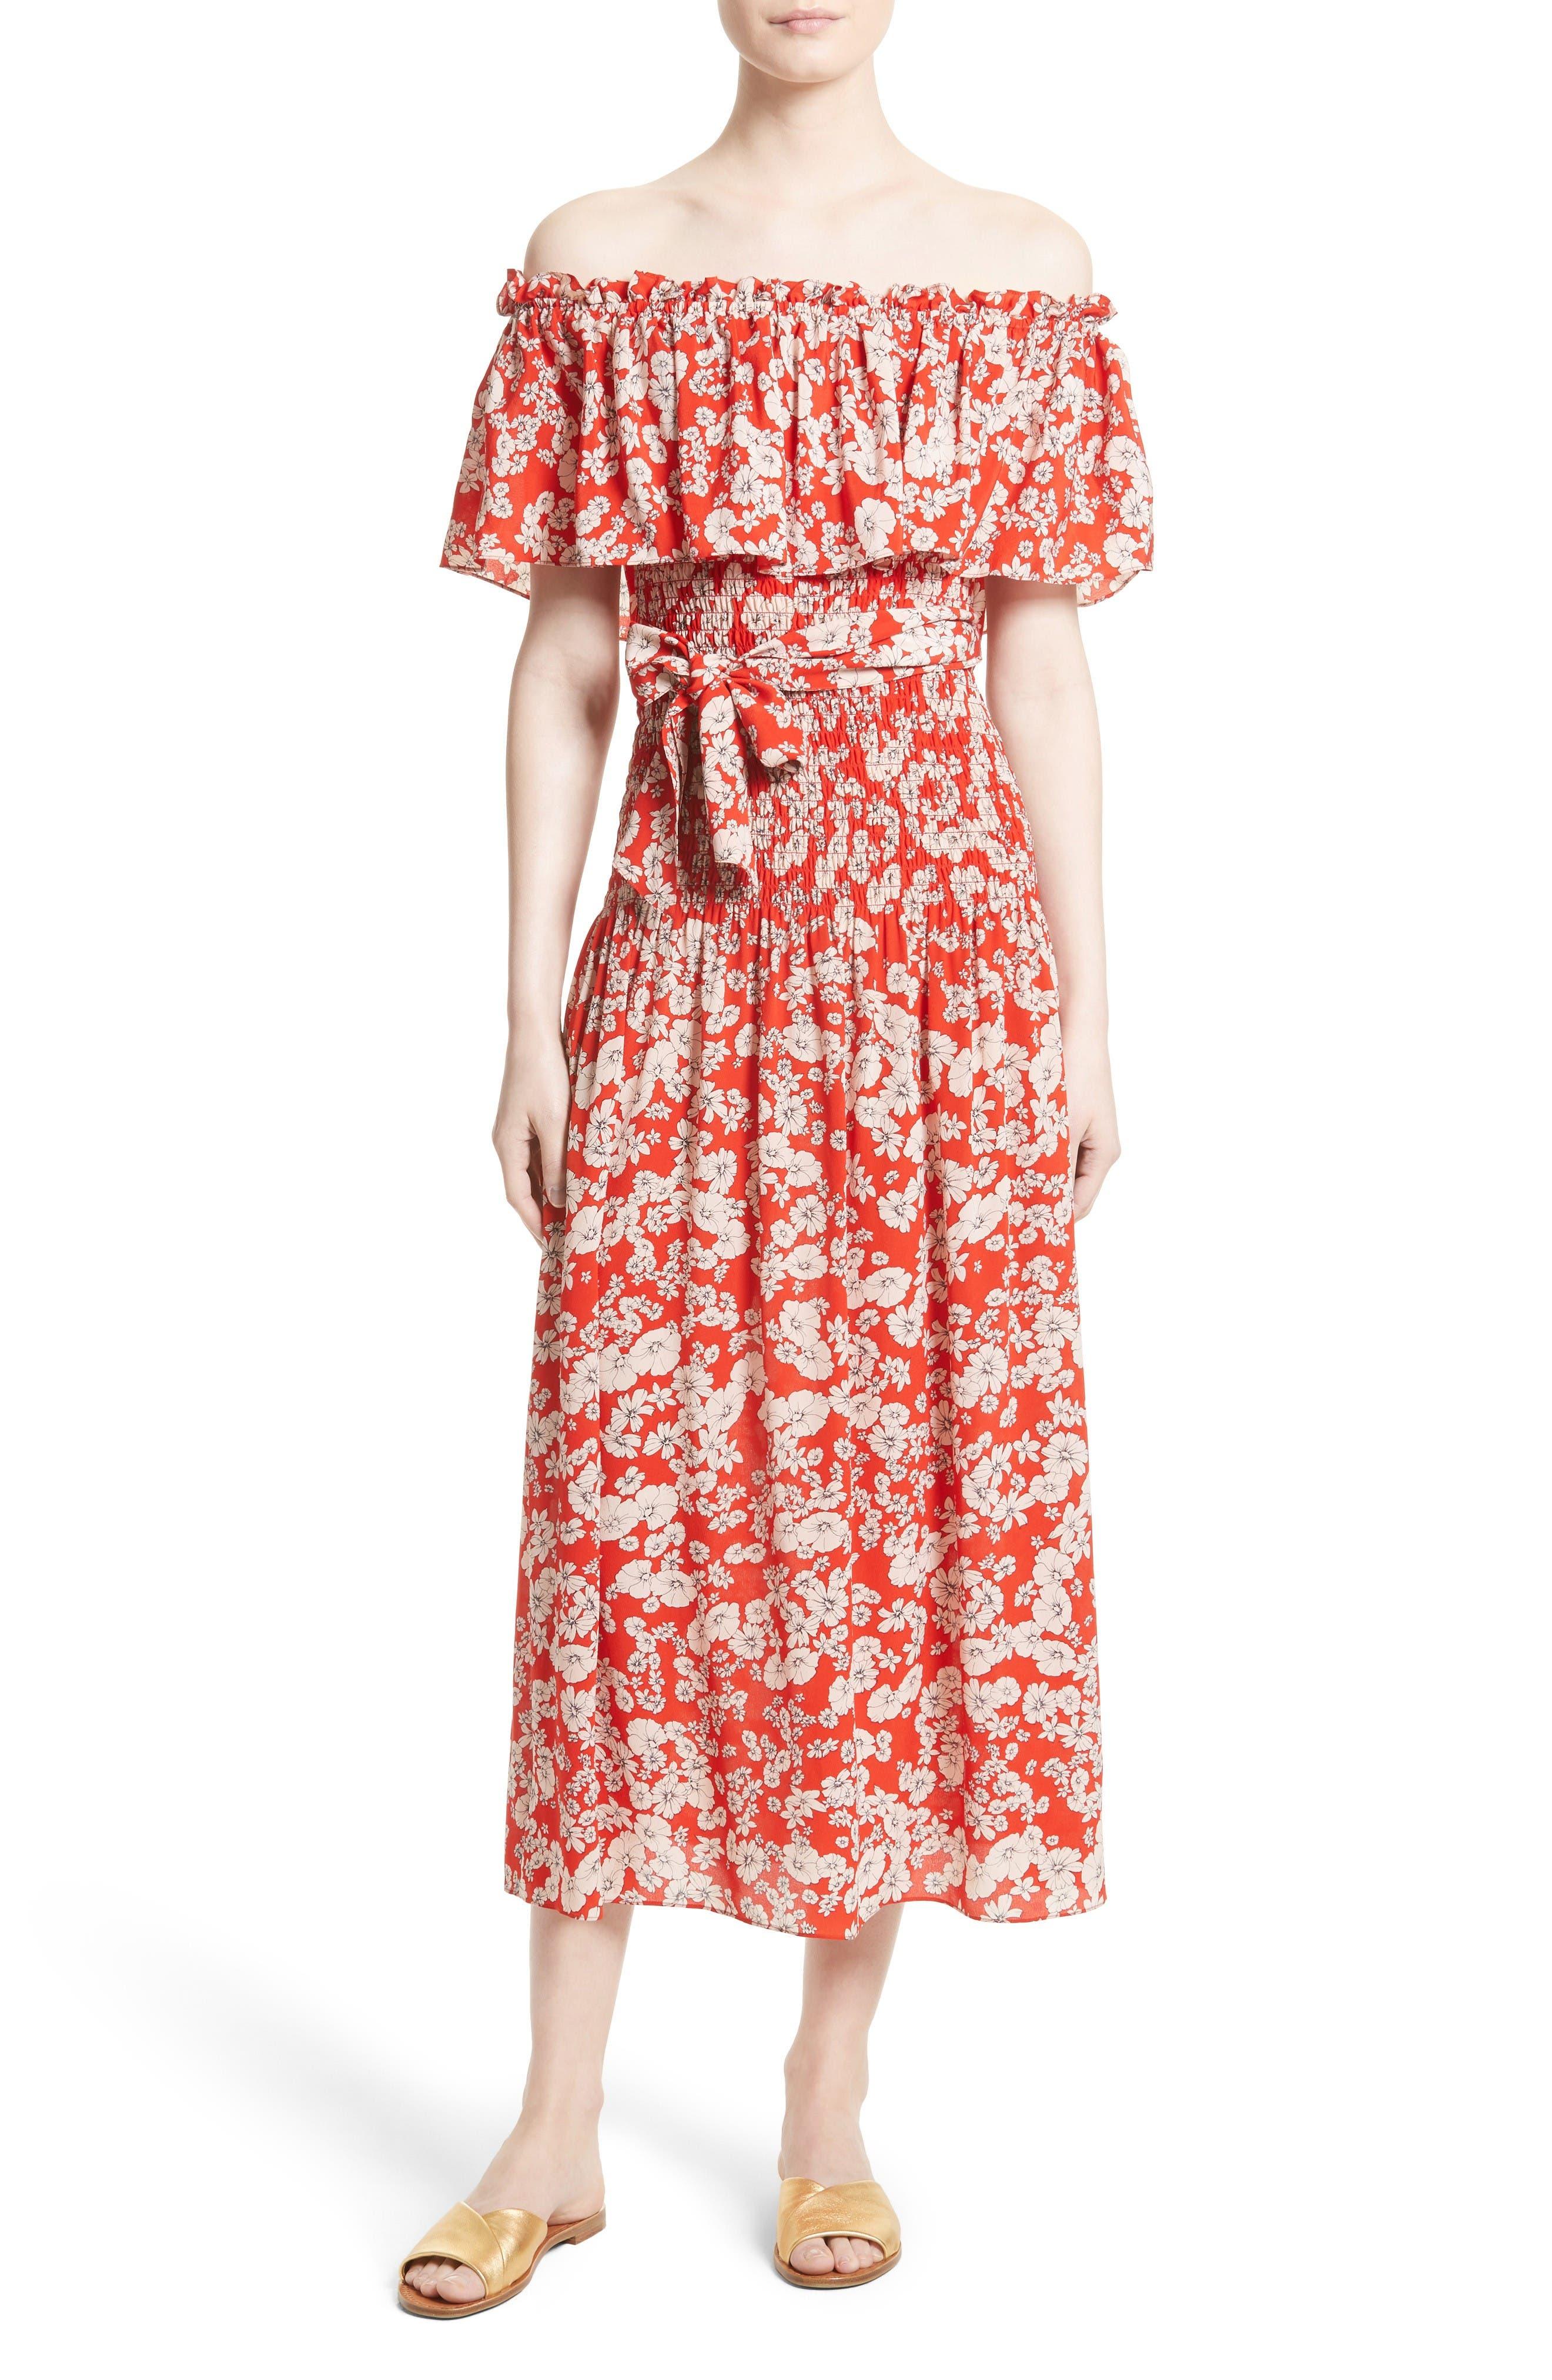 Alternate Image 1 Selected - Rebecca Taylor Cherry Blossom Silk Off the Shoulder Dress